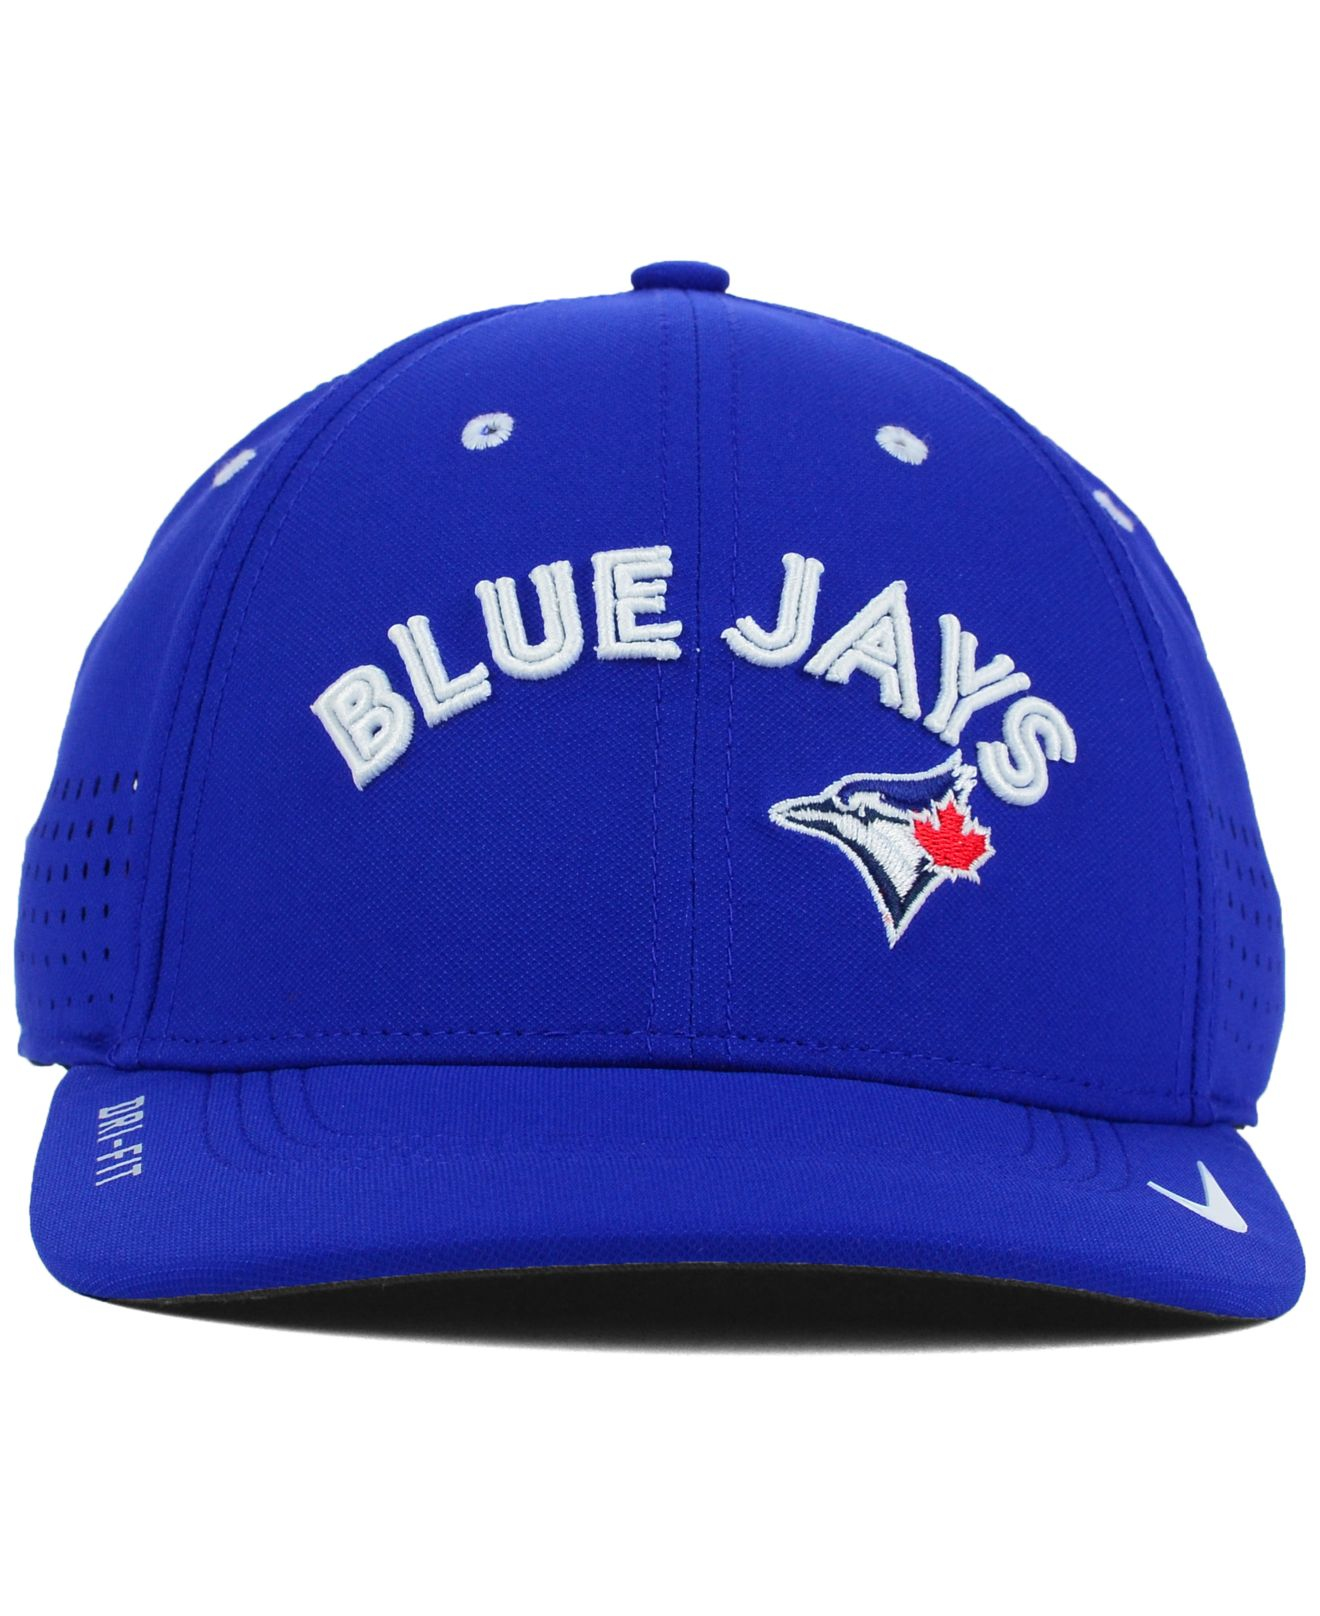 84fdcb80a19 ... order lyst nike toronto blue jays vapor swoosh flex cap in blue for men  72166 1ed21